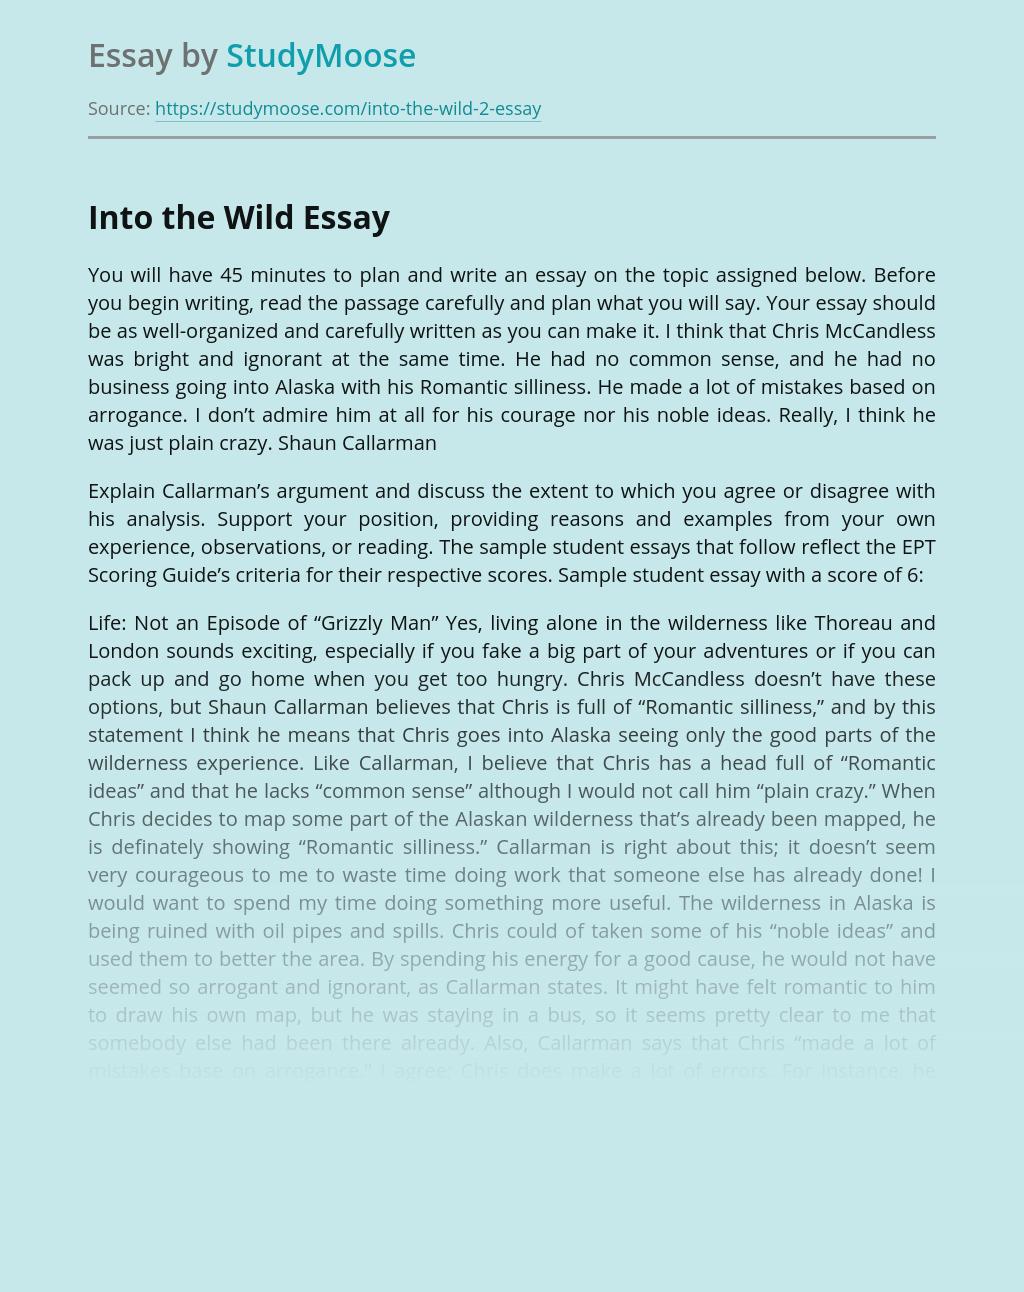 Into the Wild: Chris McCandless